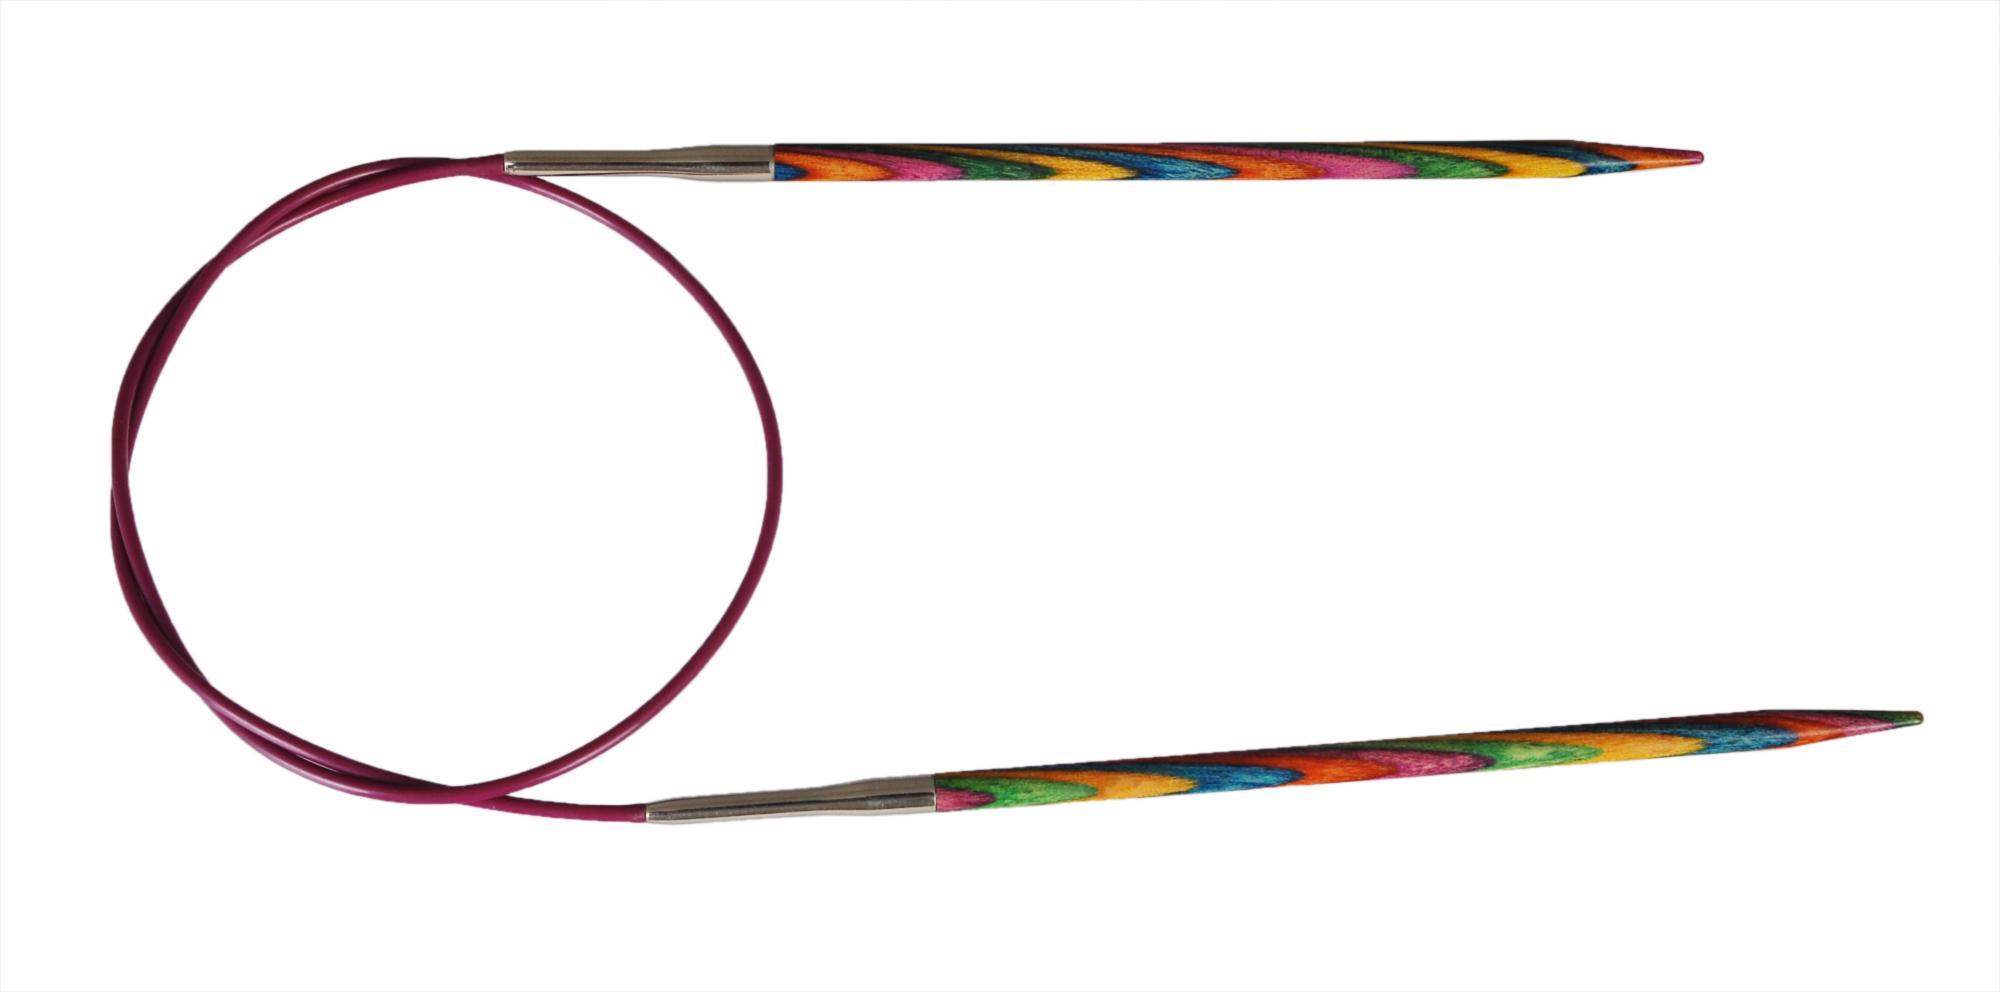 Спицы круговые 150 см Symfonie Wood KnitPro, 20512, 2.25 мм